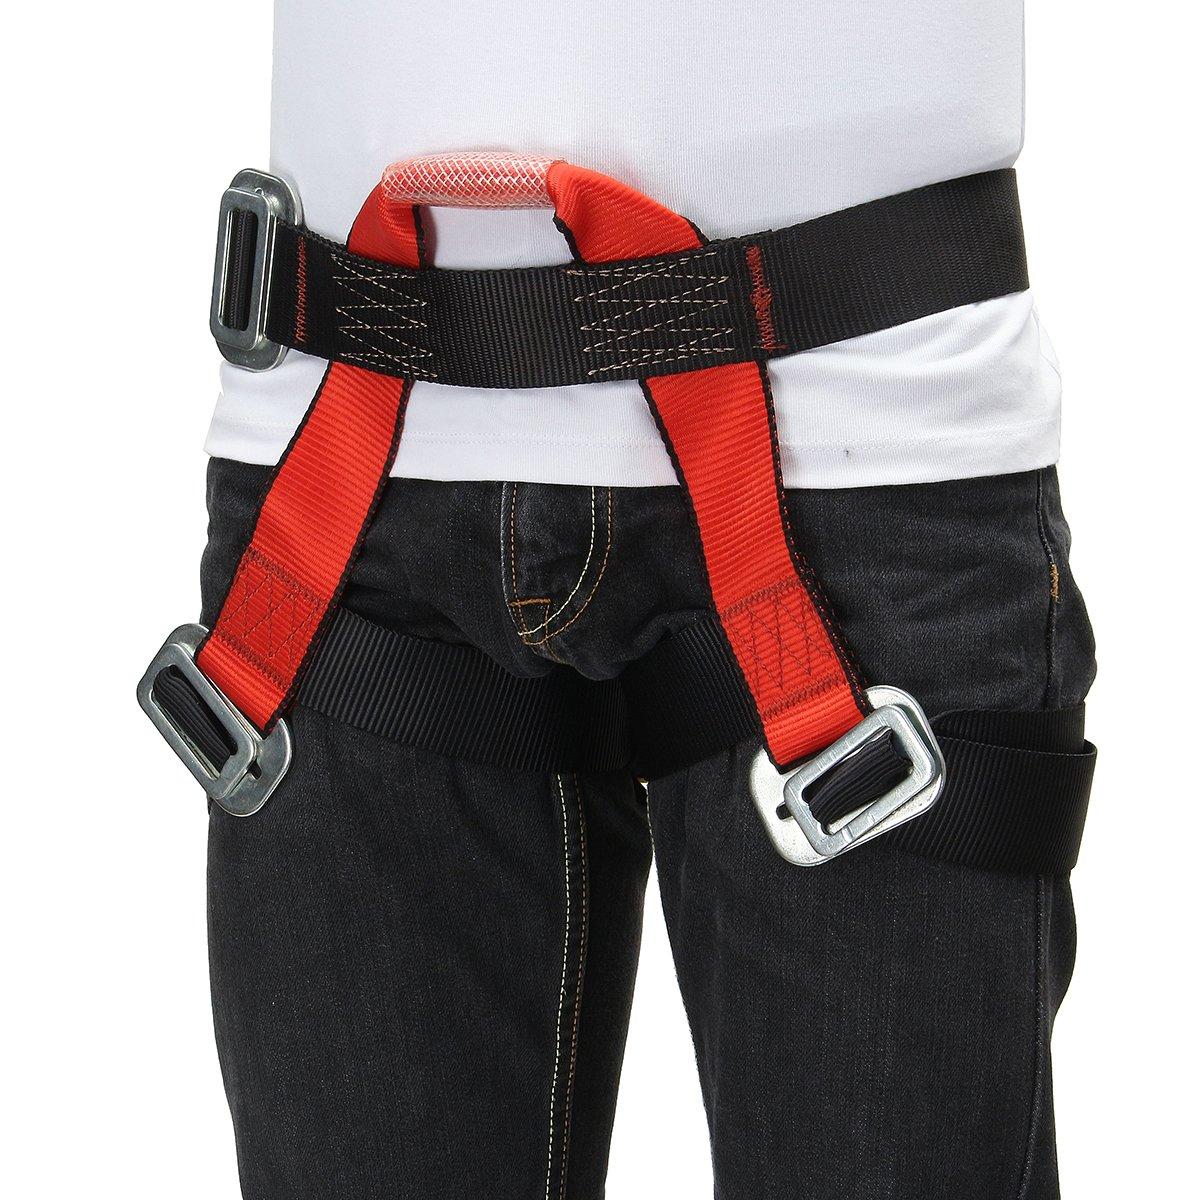 QOJA outdoor mountain rock climbing rappelling harness bust belt by QOJA (Image #4)